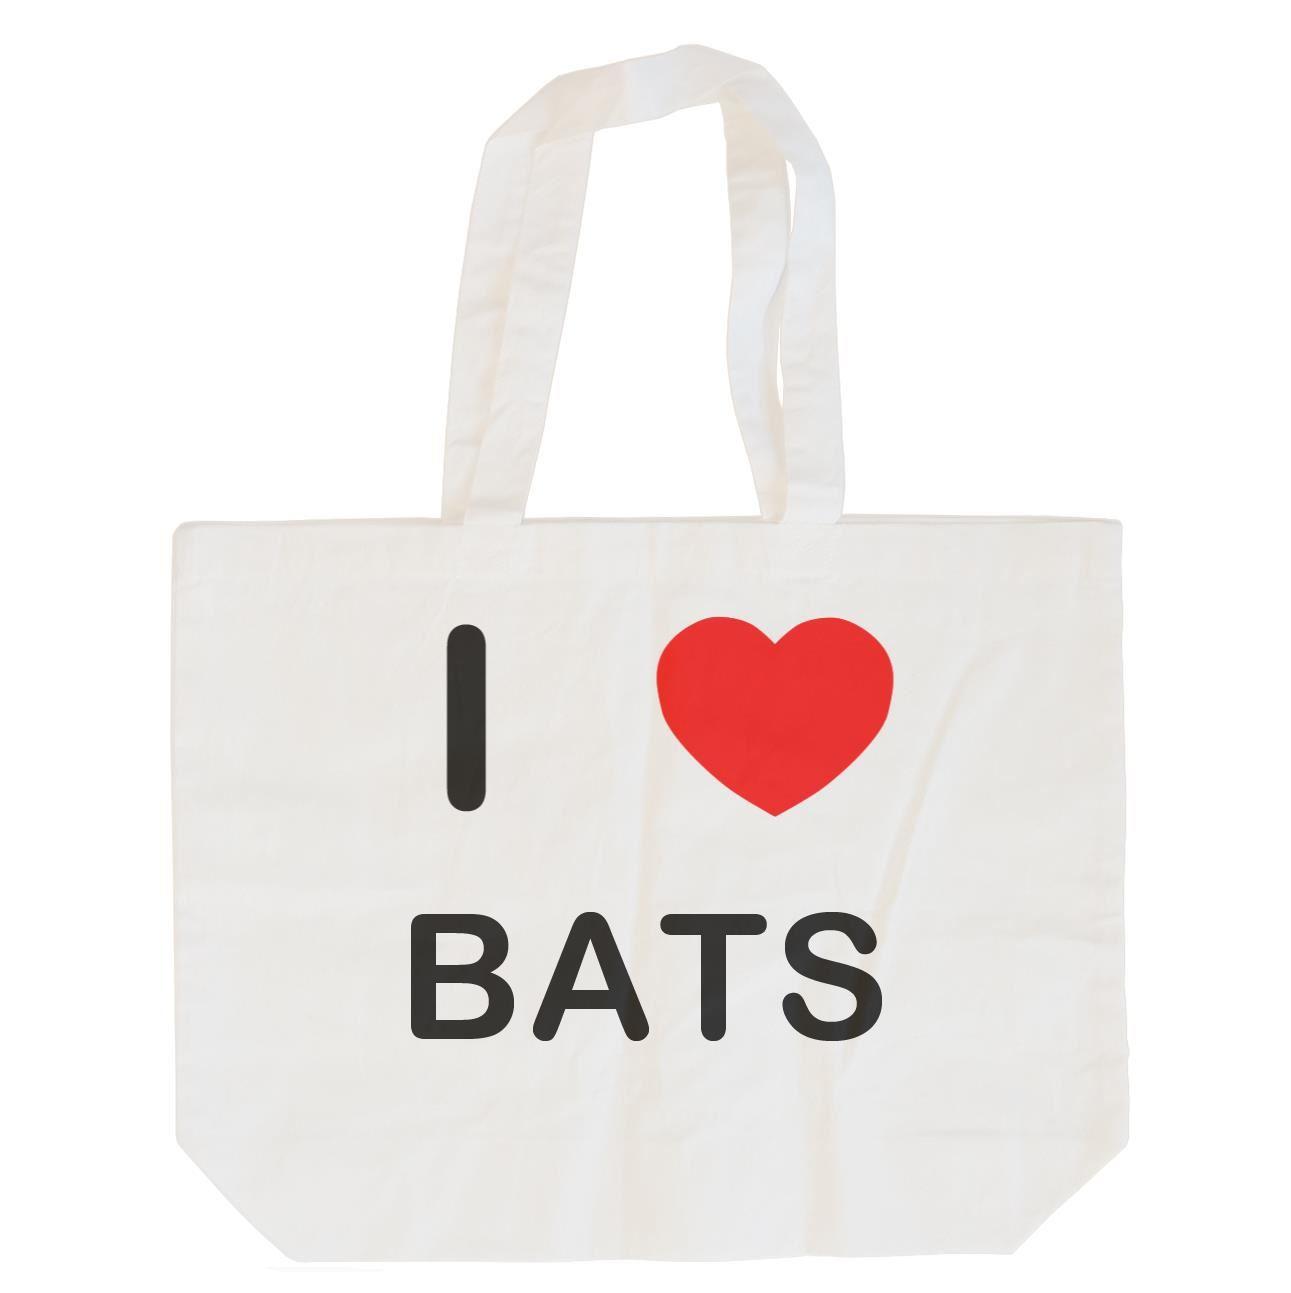 I Love Bats - Cotton Bag | Size choice Tote, Shopper or Sling